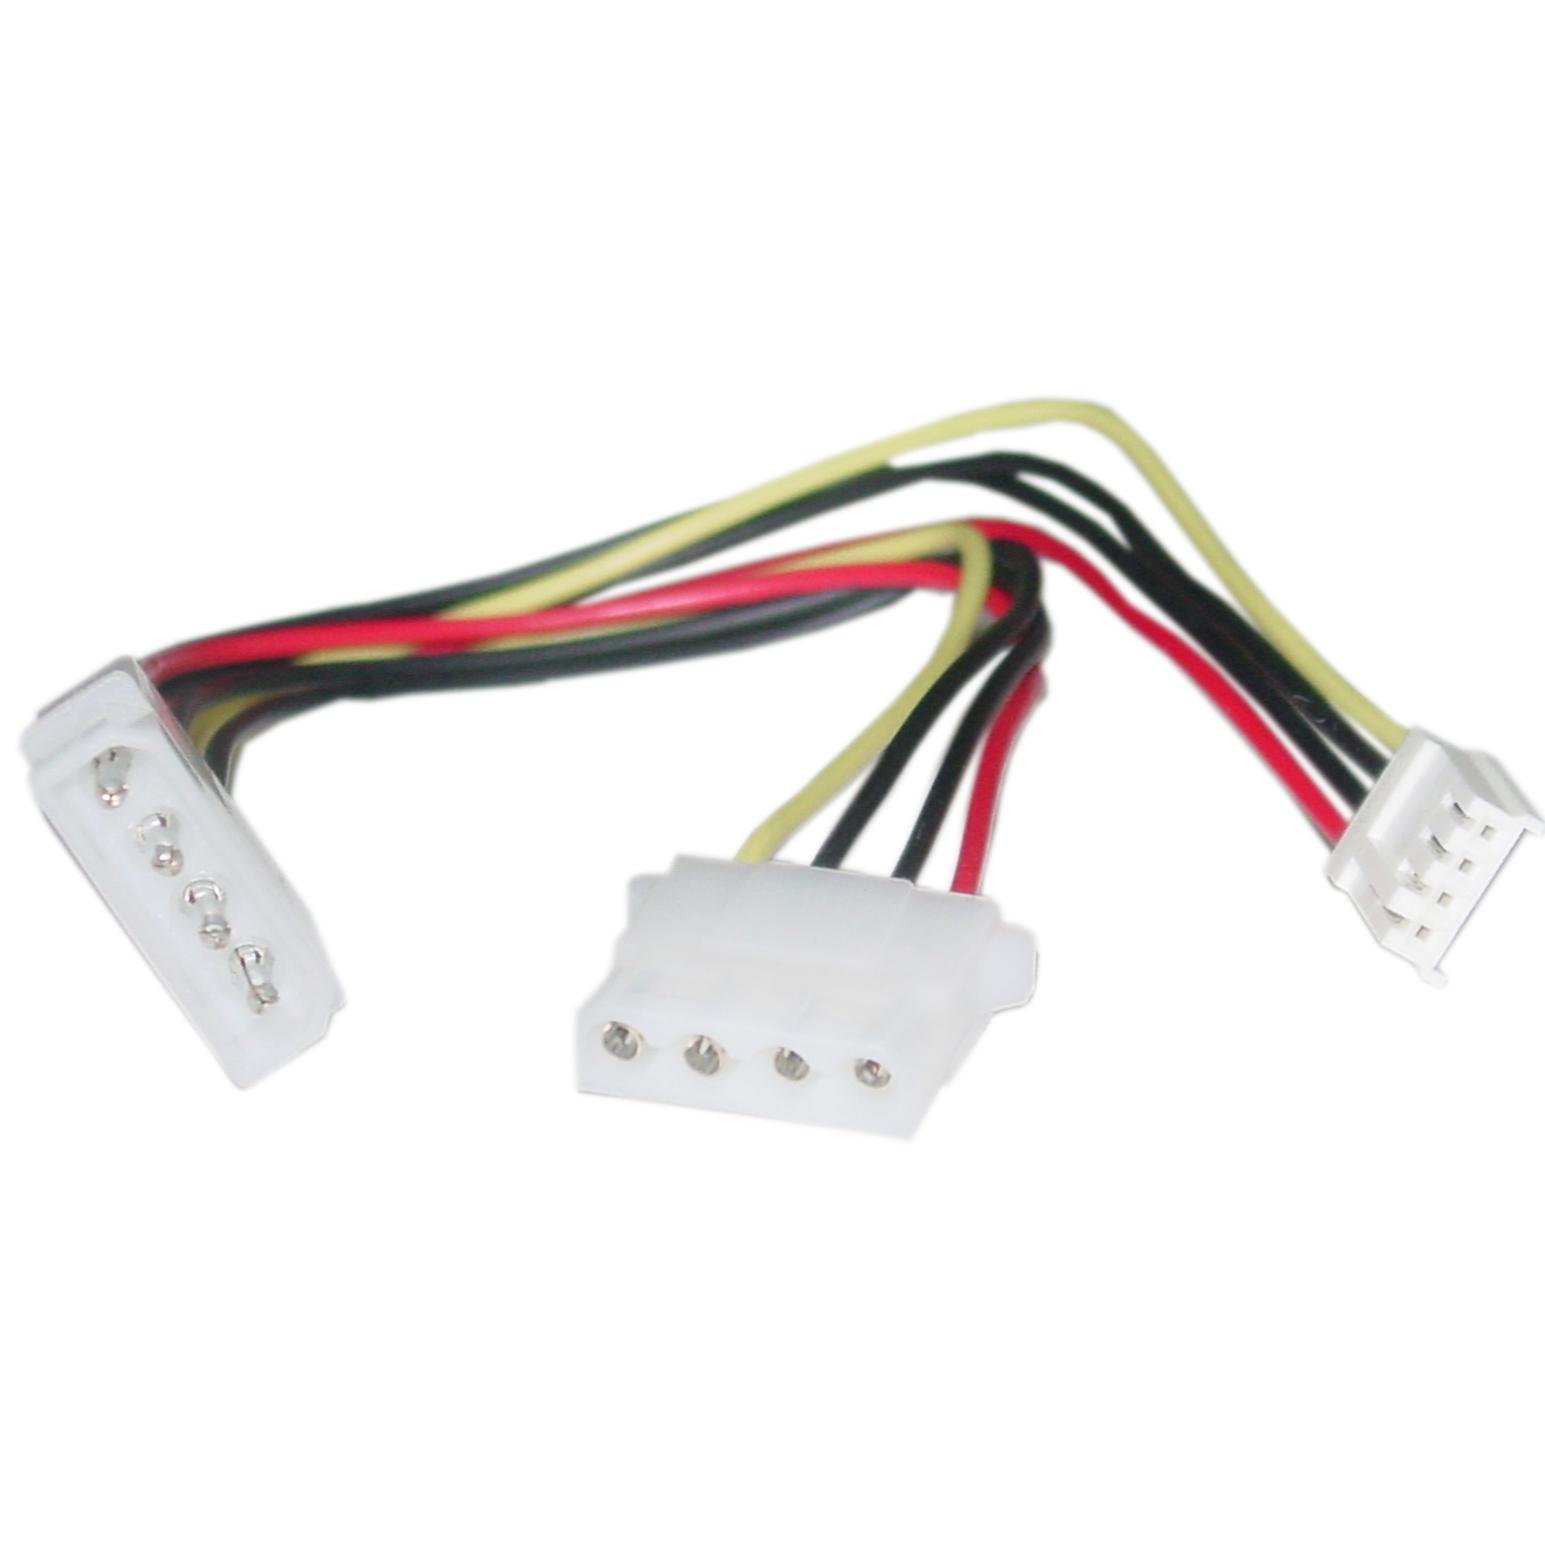 3 pin molex wiring diagram 1jz fse 4 connector 36